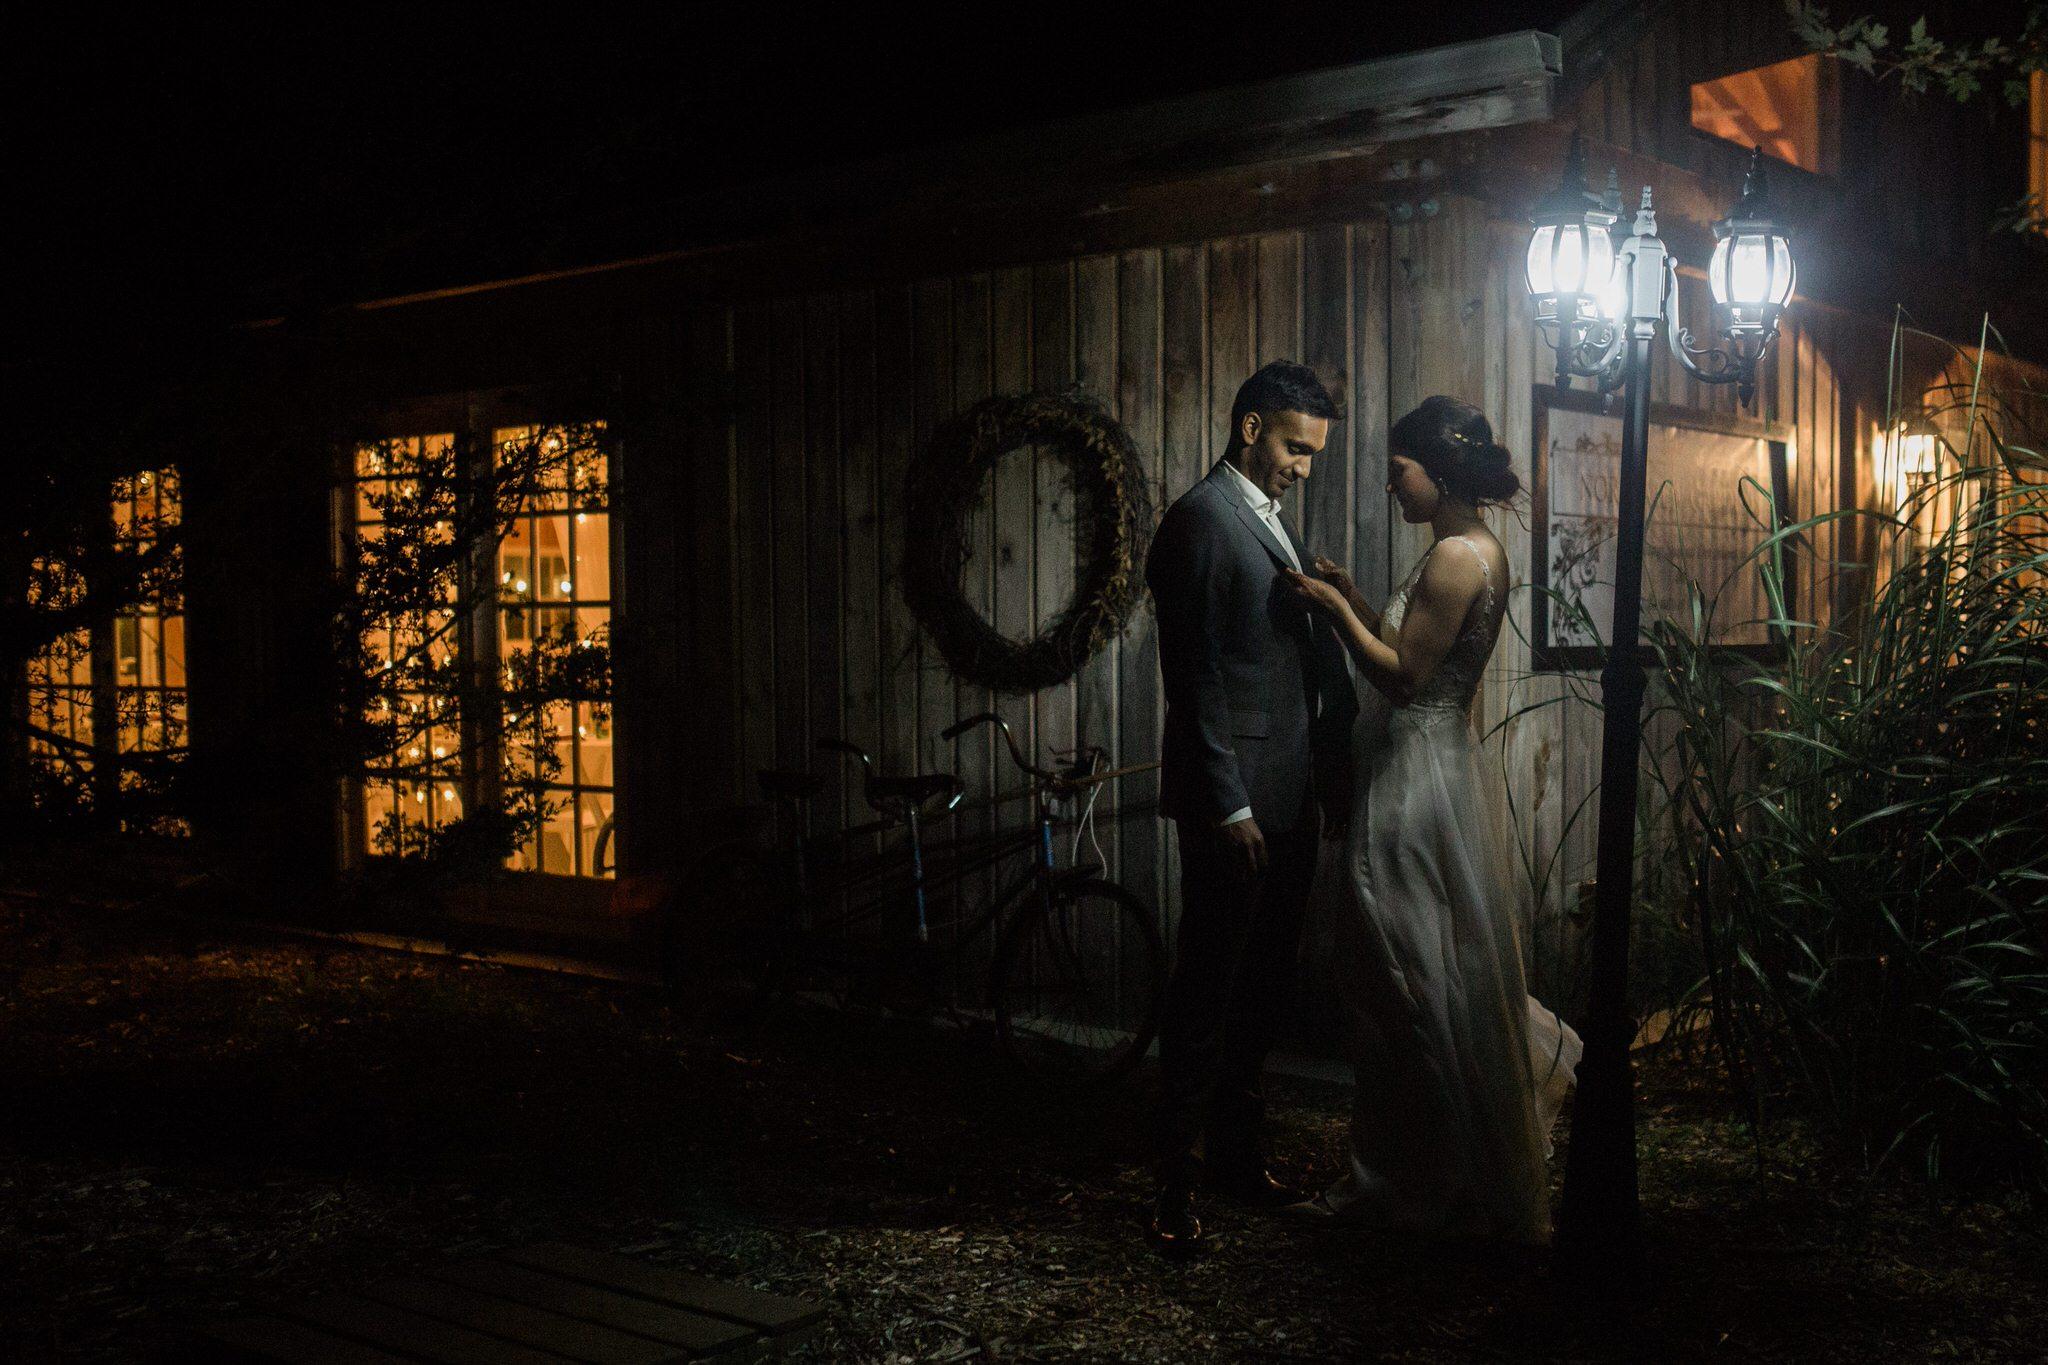 Northview Gardens Wedding - bride and groom night portrait